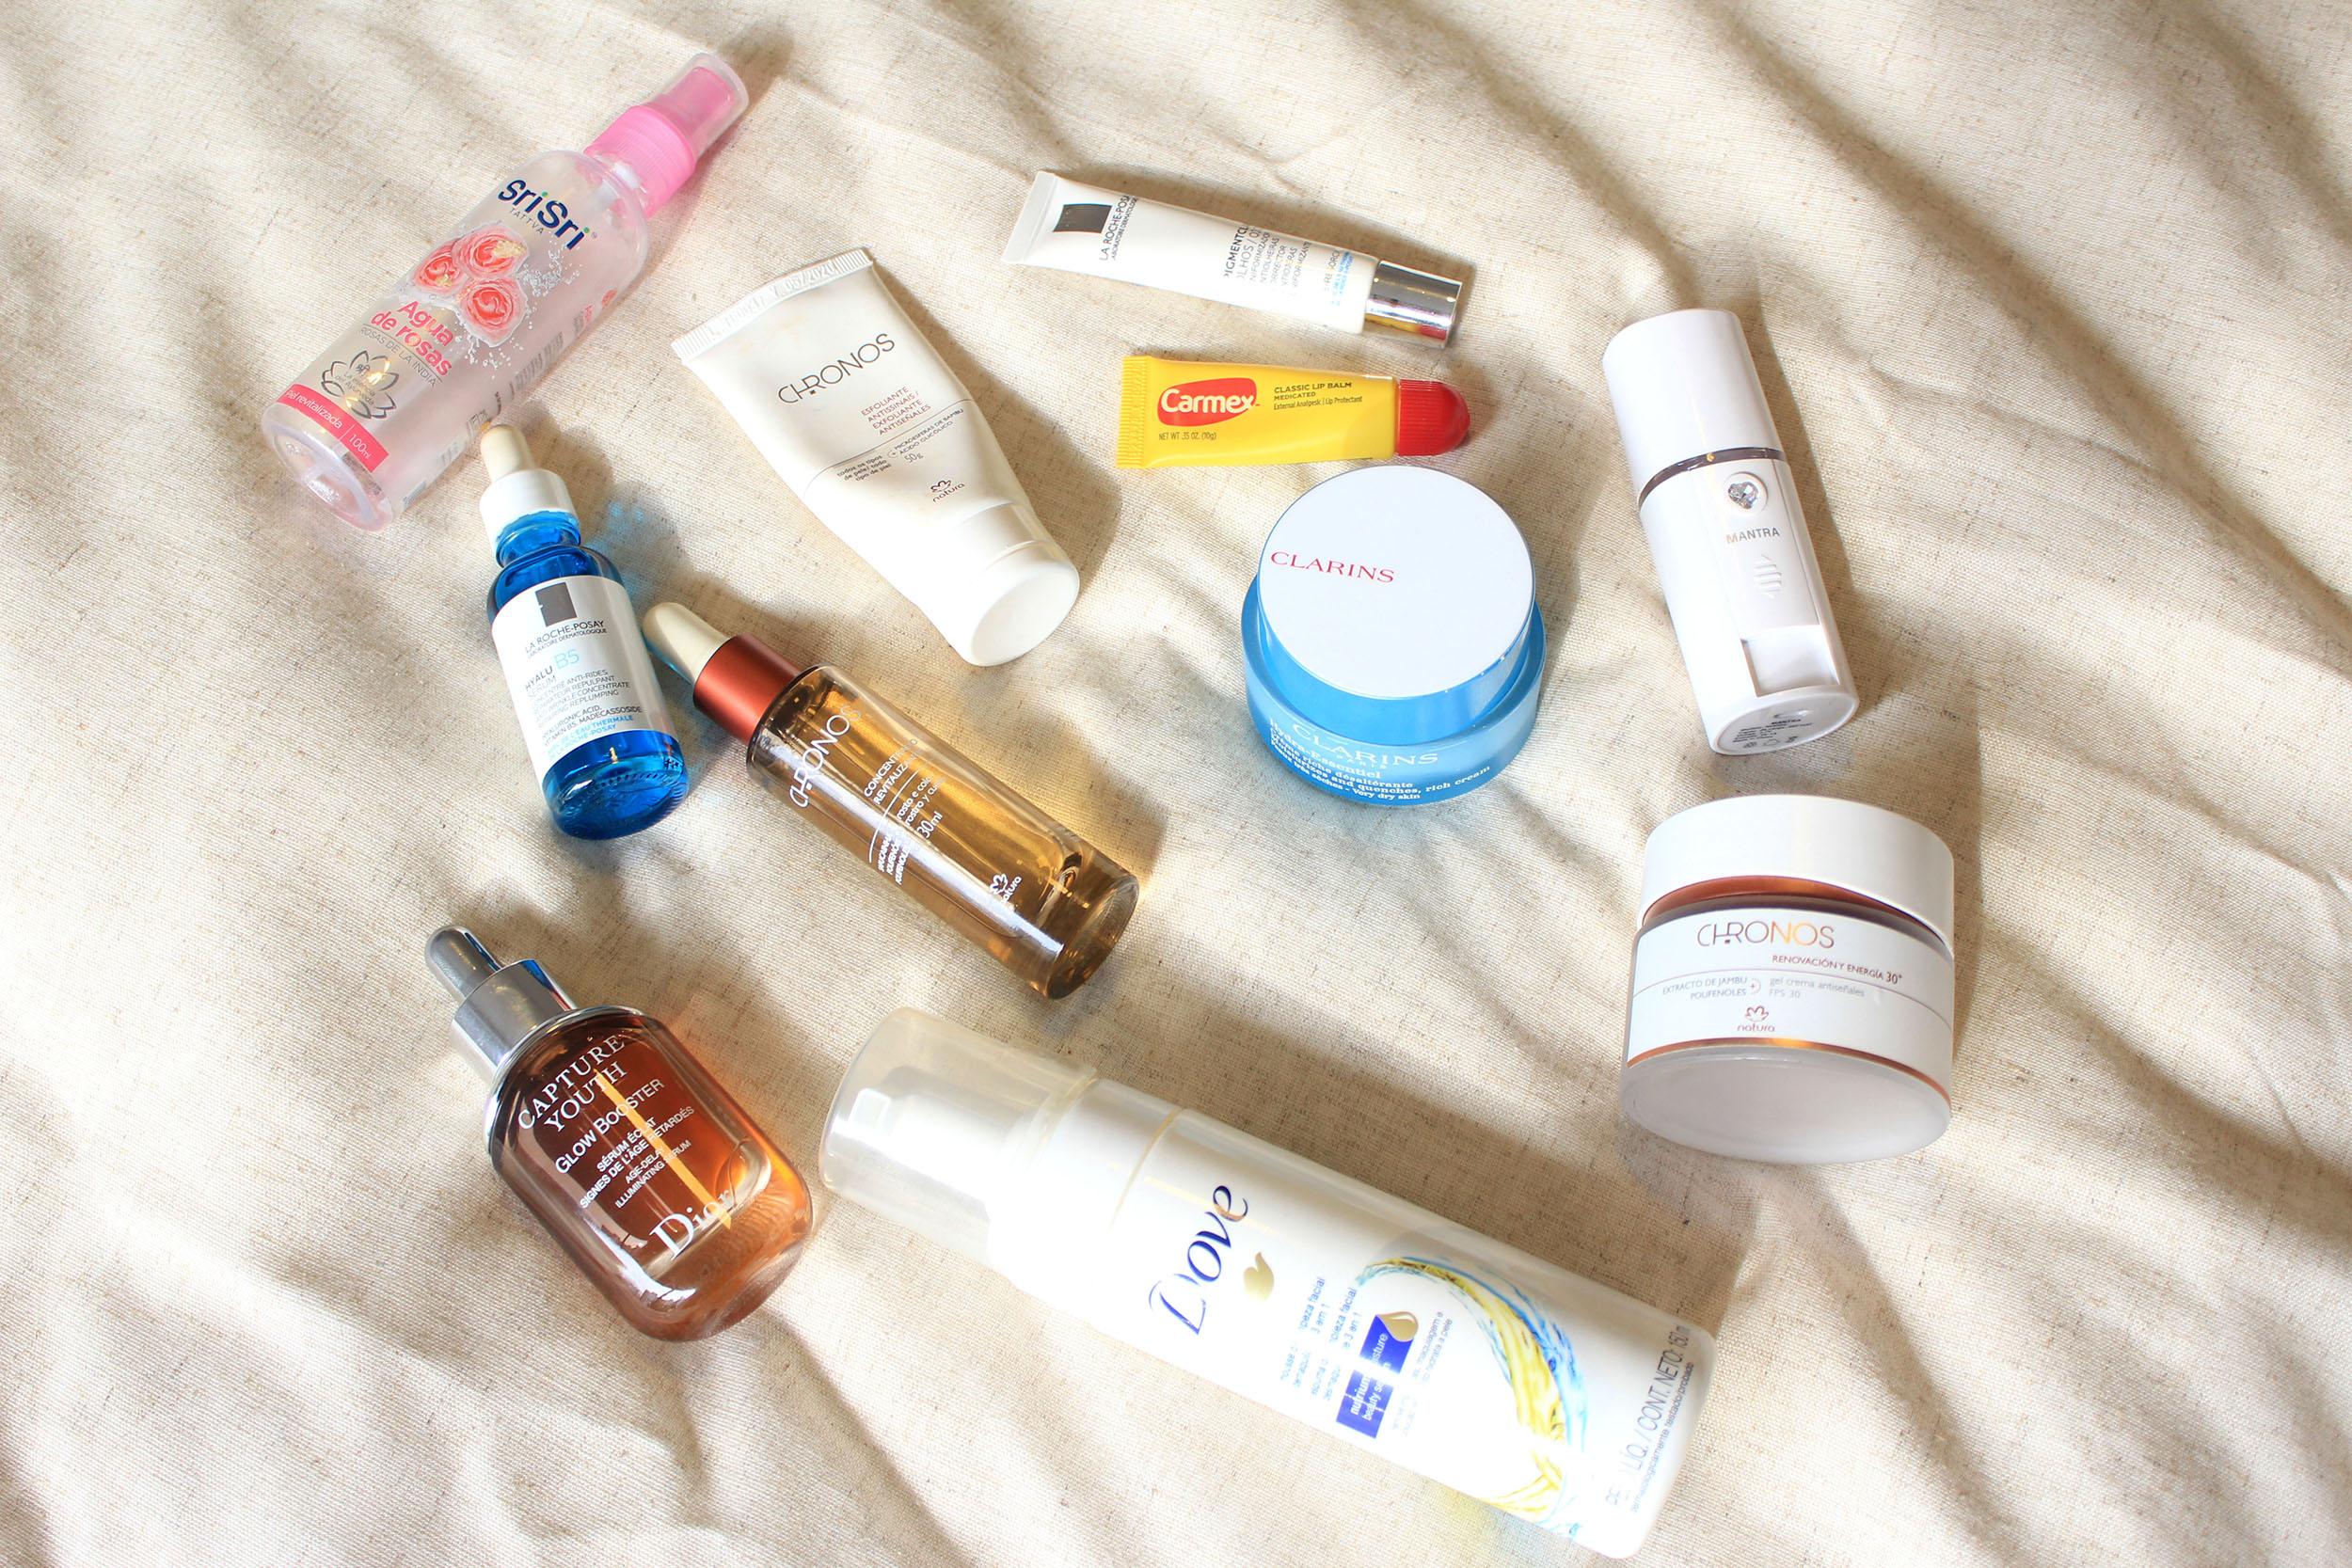 Favoritos Skincare 2019: los mejores productos de Cuidado Facial | I'm Karenina TV